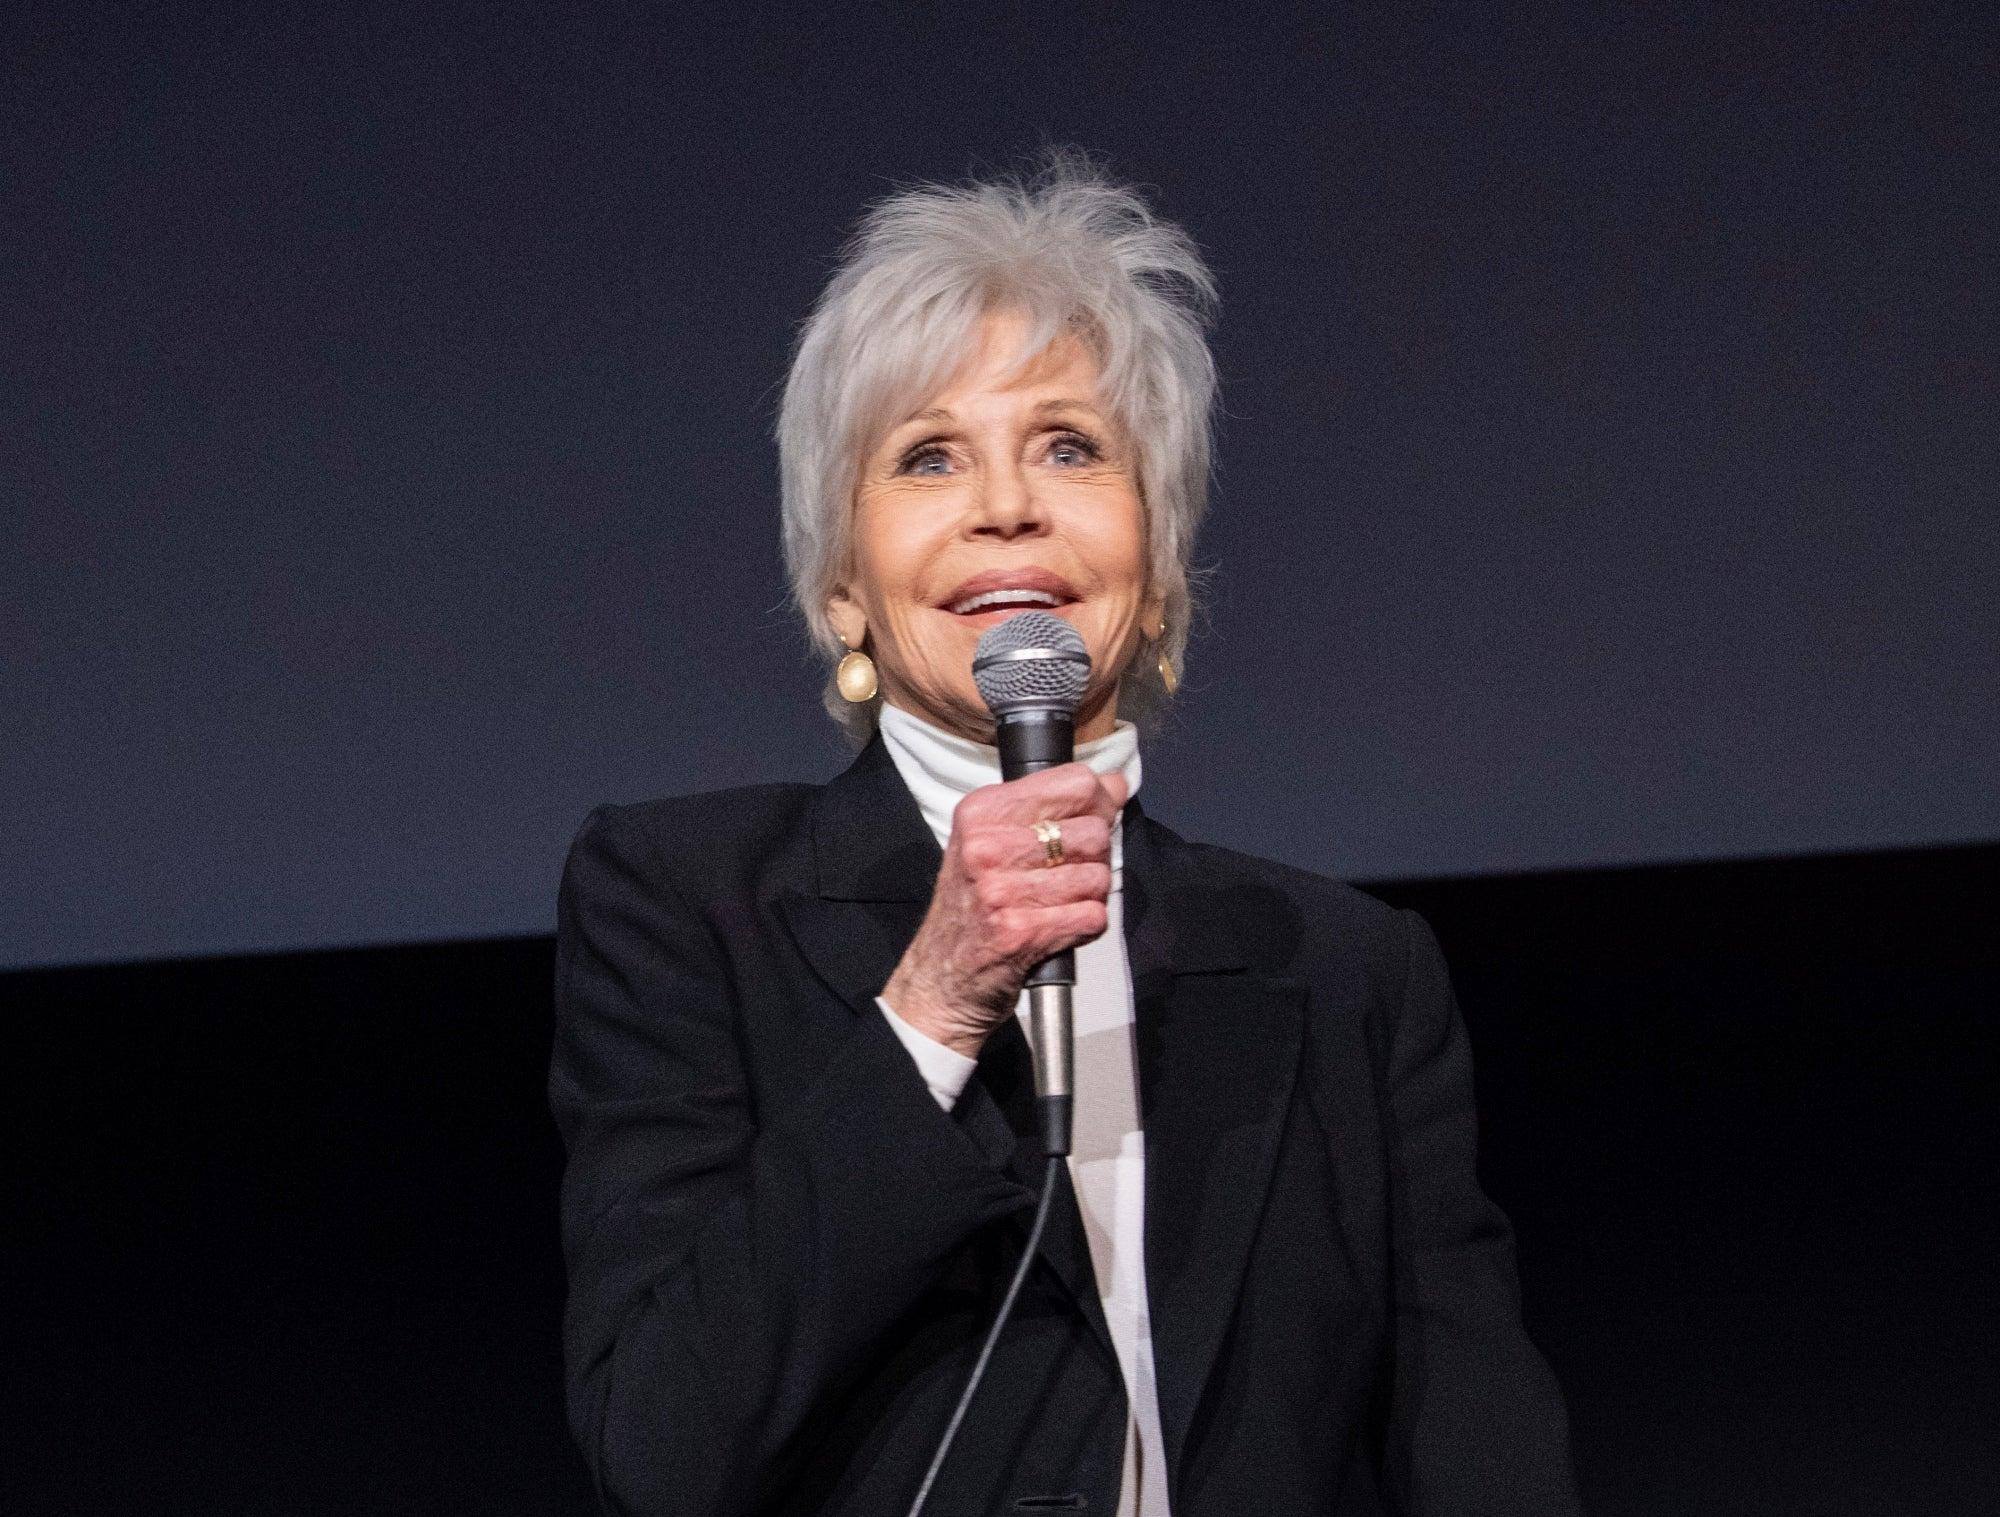 Jane Fonda at the Restoration Summit 2020